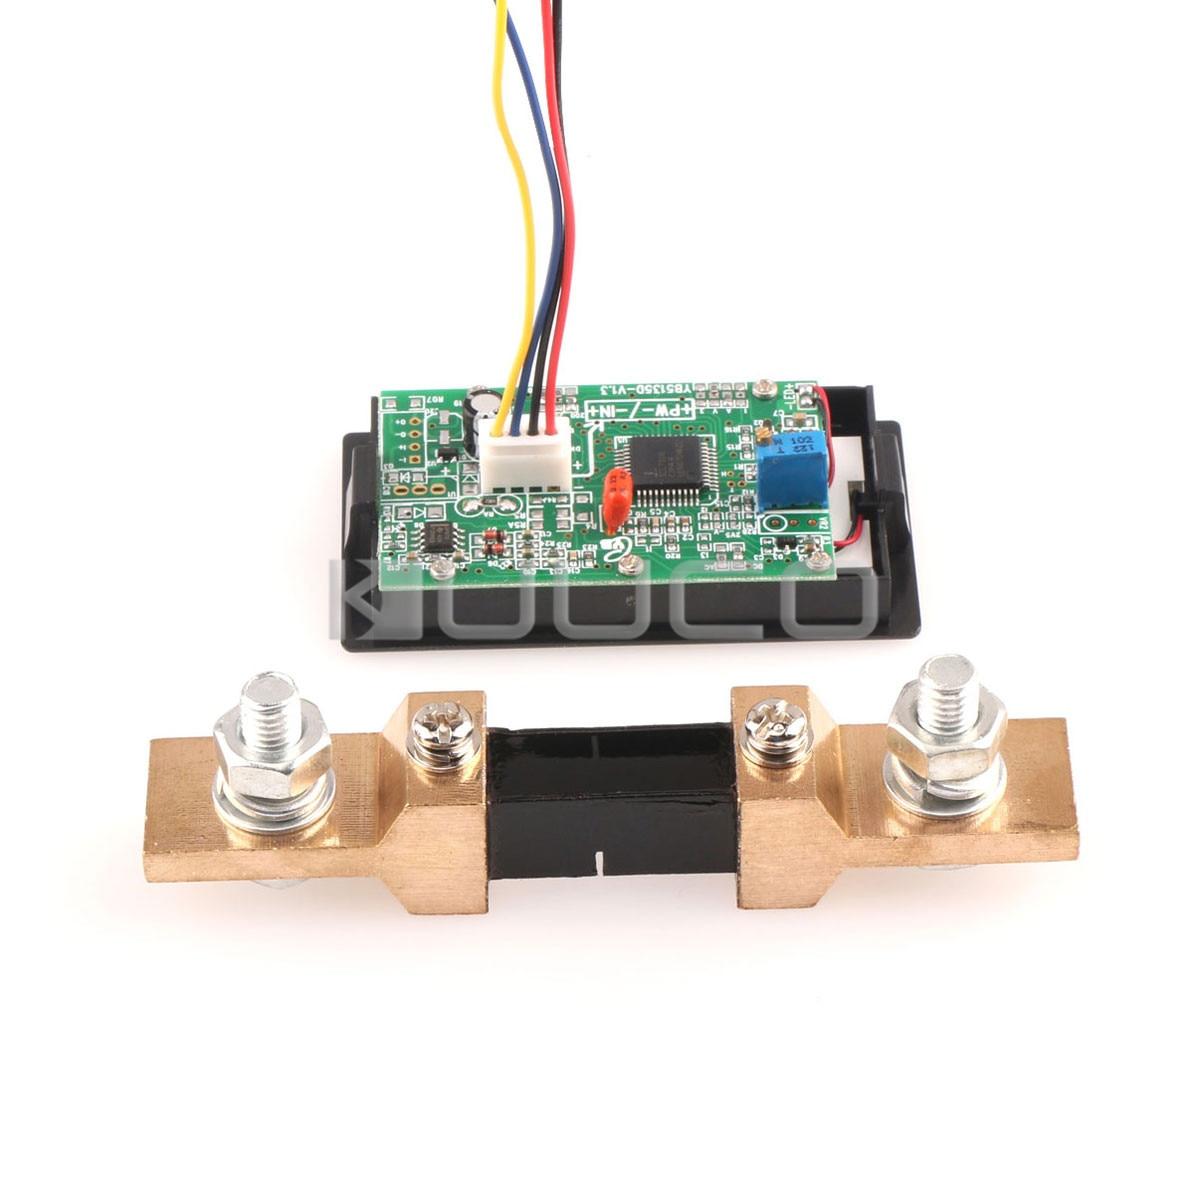 Dc Ammeter Shunt Wiring Diagram Trusted Aftermarket Amp Gauge Digital Tester Lcd Ac 0 200a Current Meter